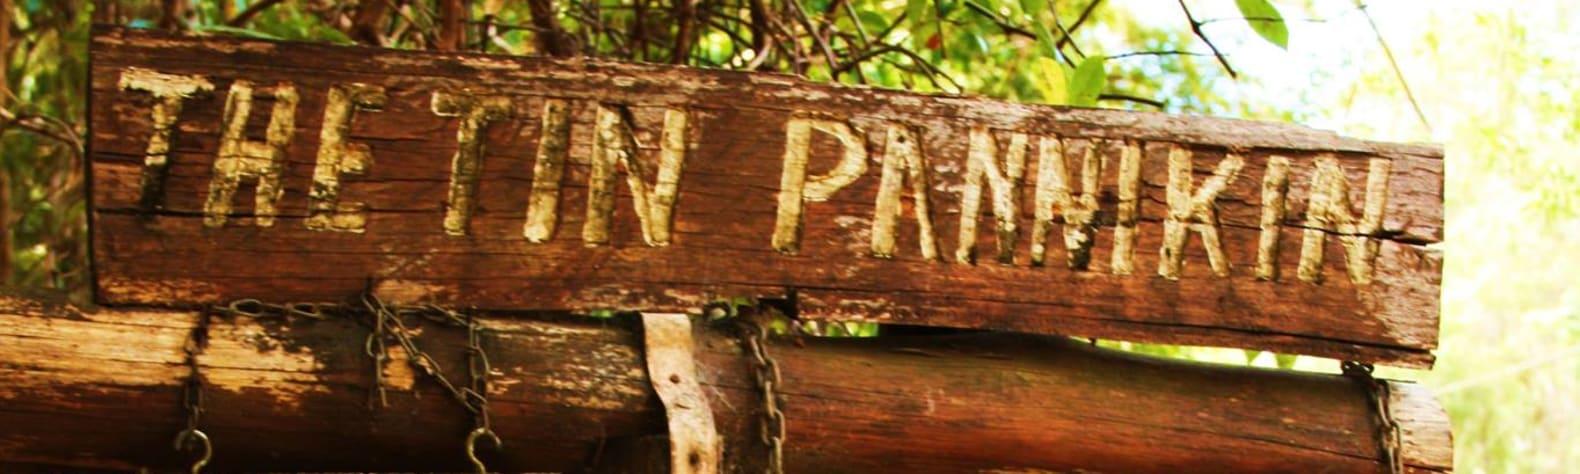 The Tin Pannikin